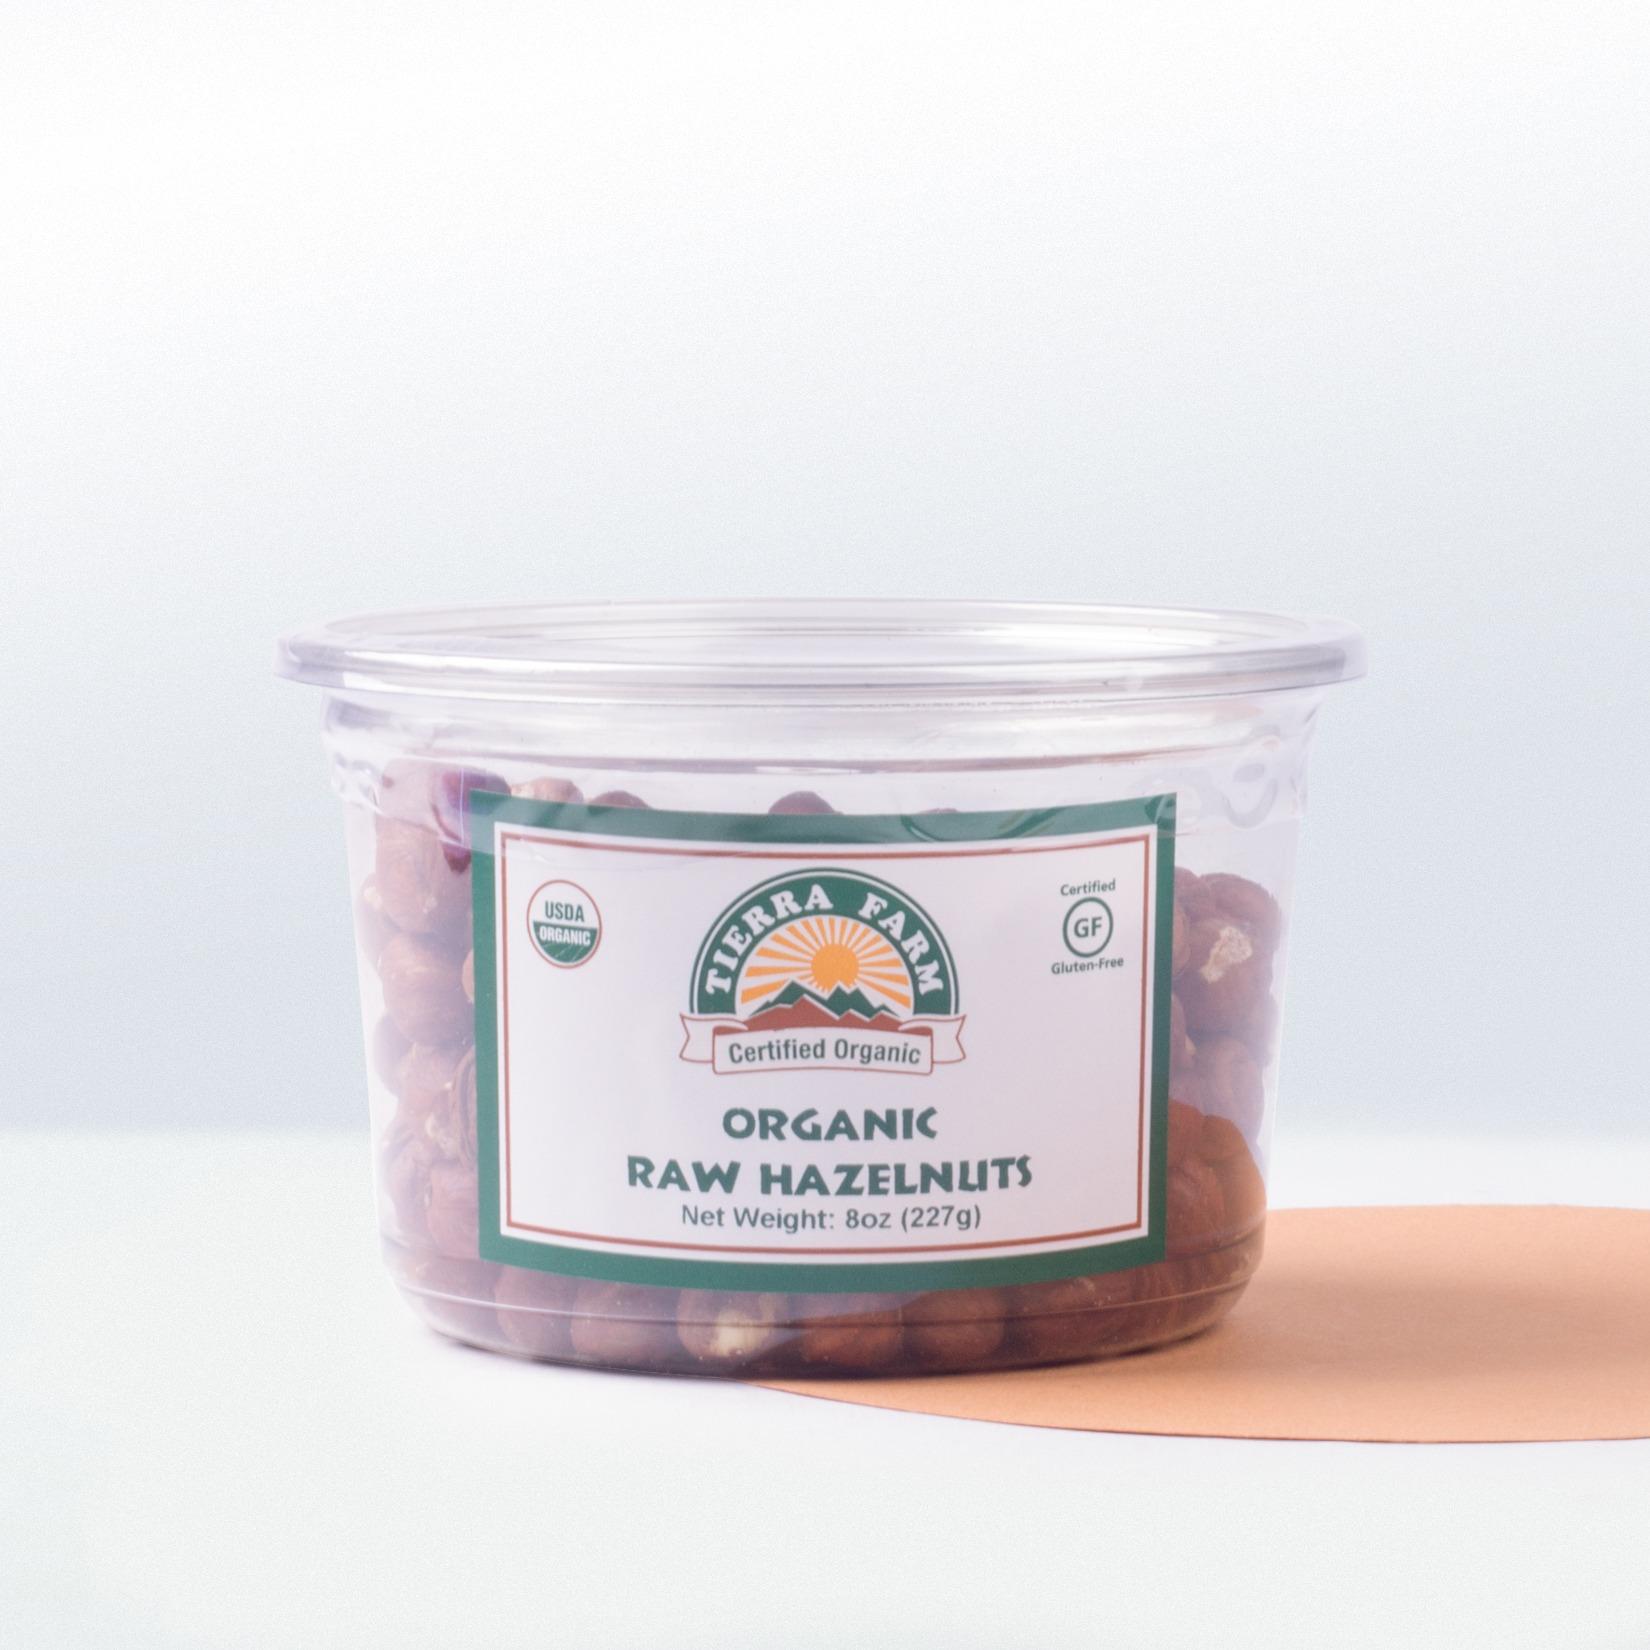 Tierra Farm-Organic Raw Hazelnuts